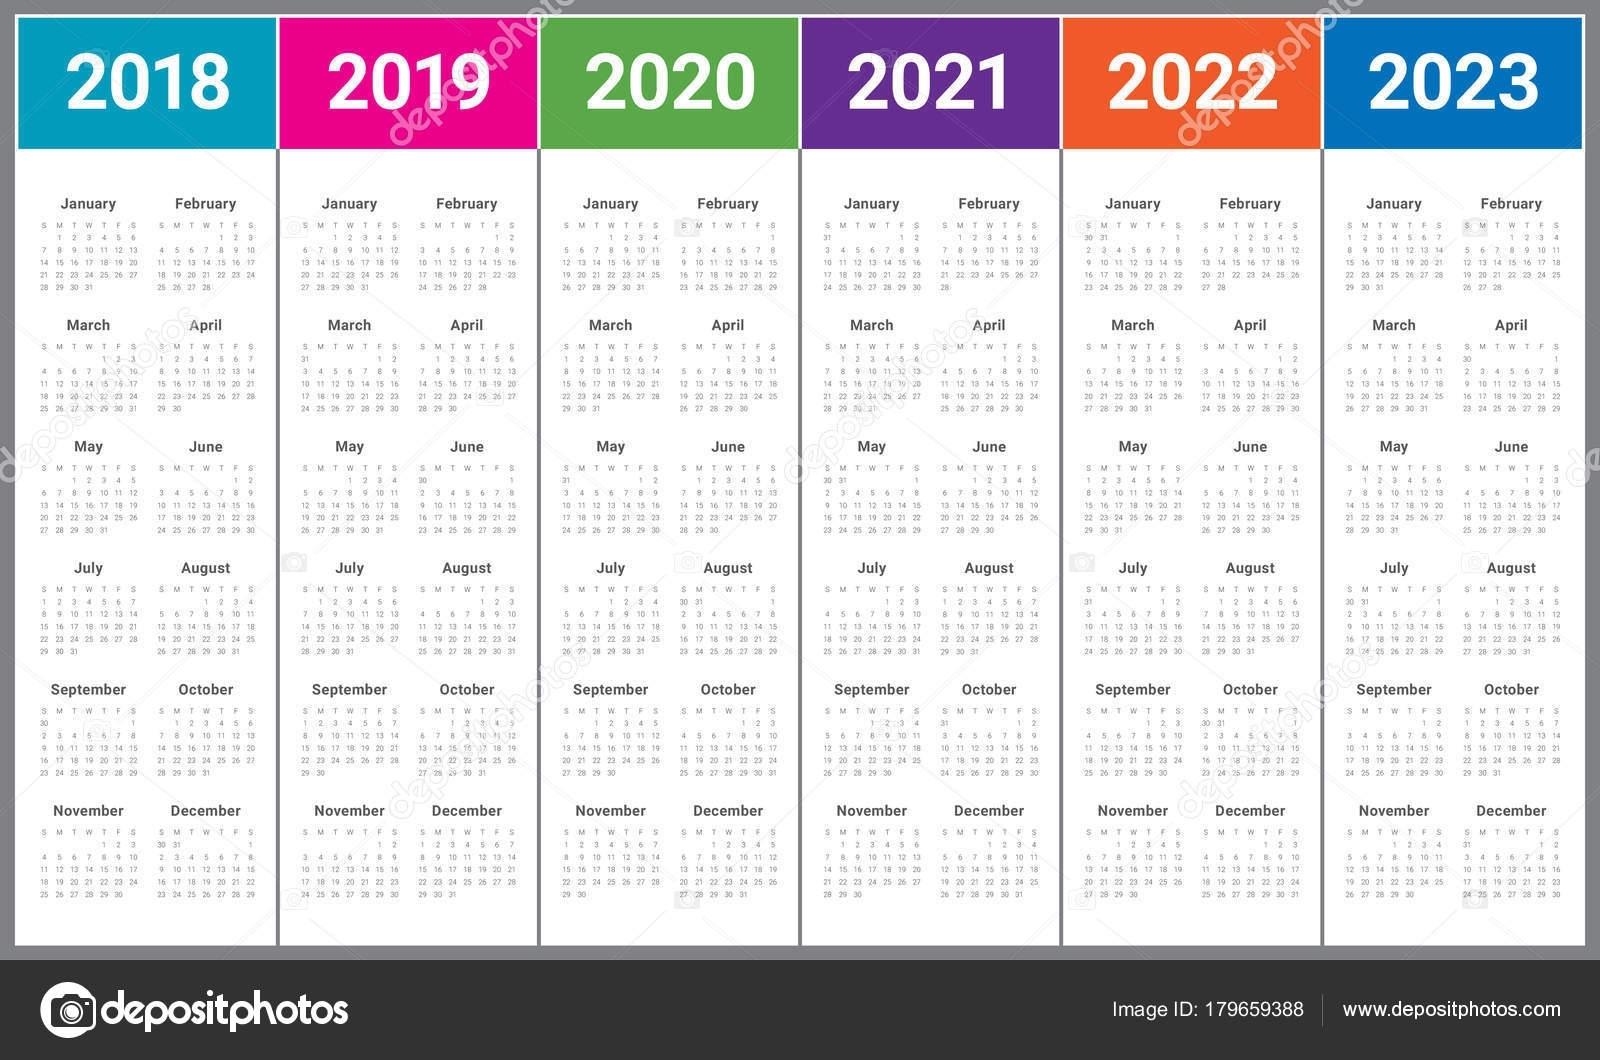 Year 2018 2019 2020 2021 2022 2023 Calendar Vector — Stock within Yearly Calendar 2020 2021 2022 2023